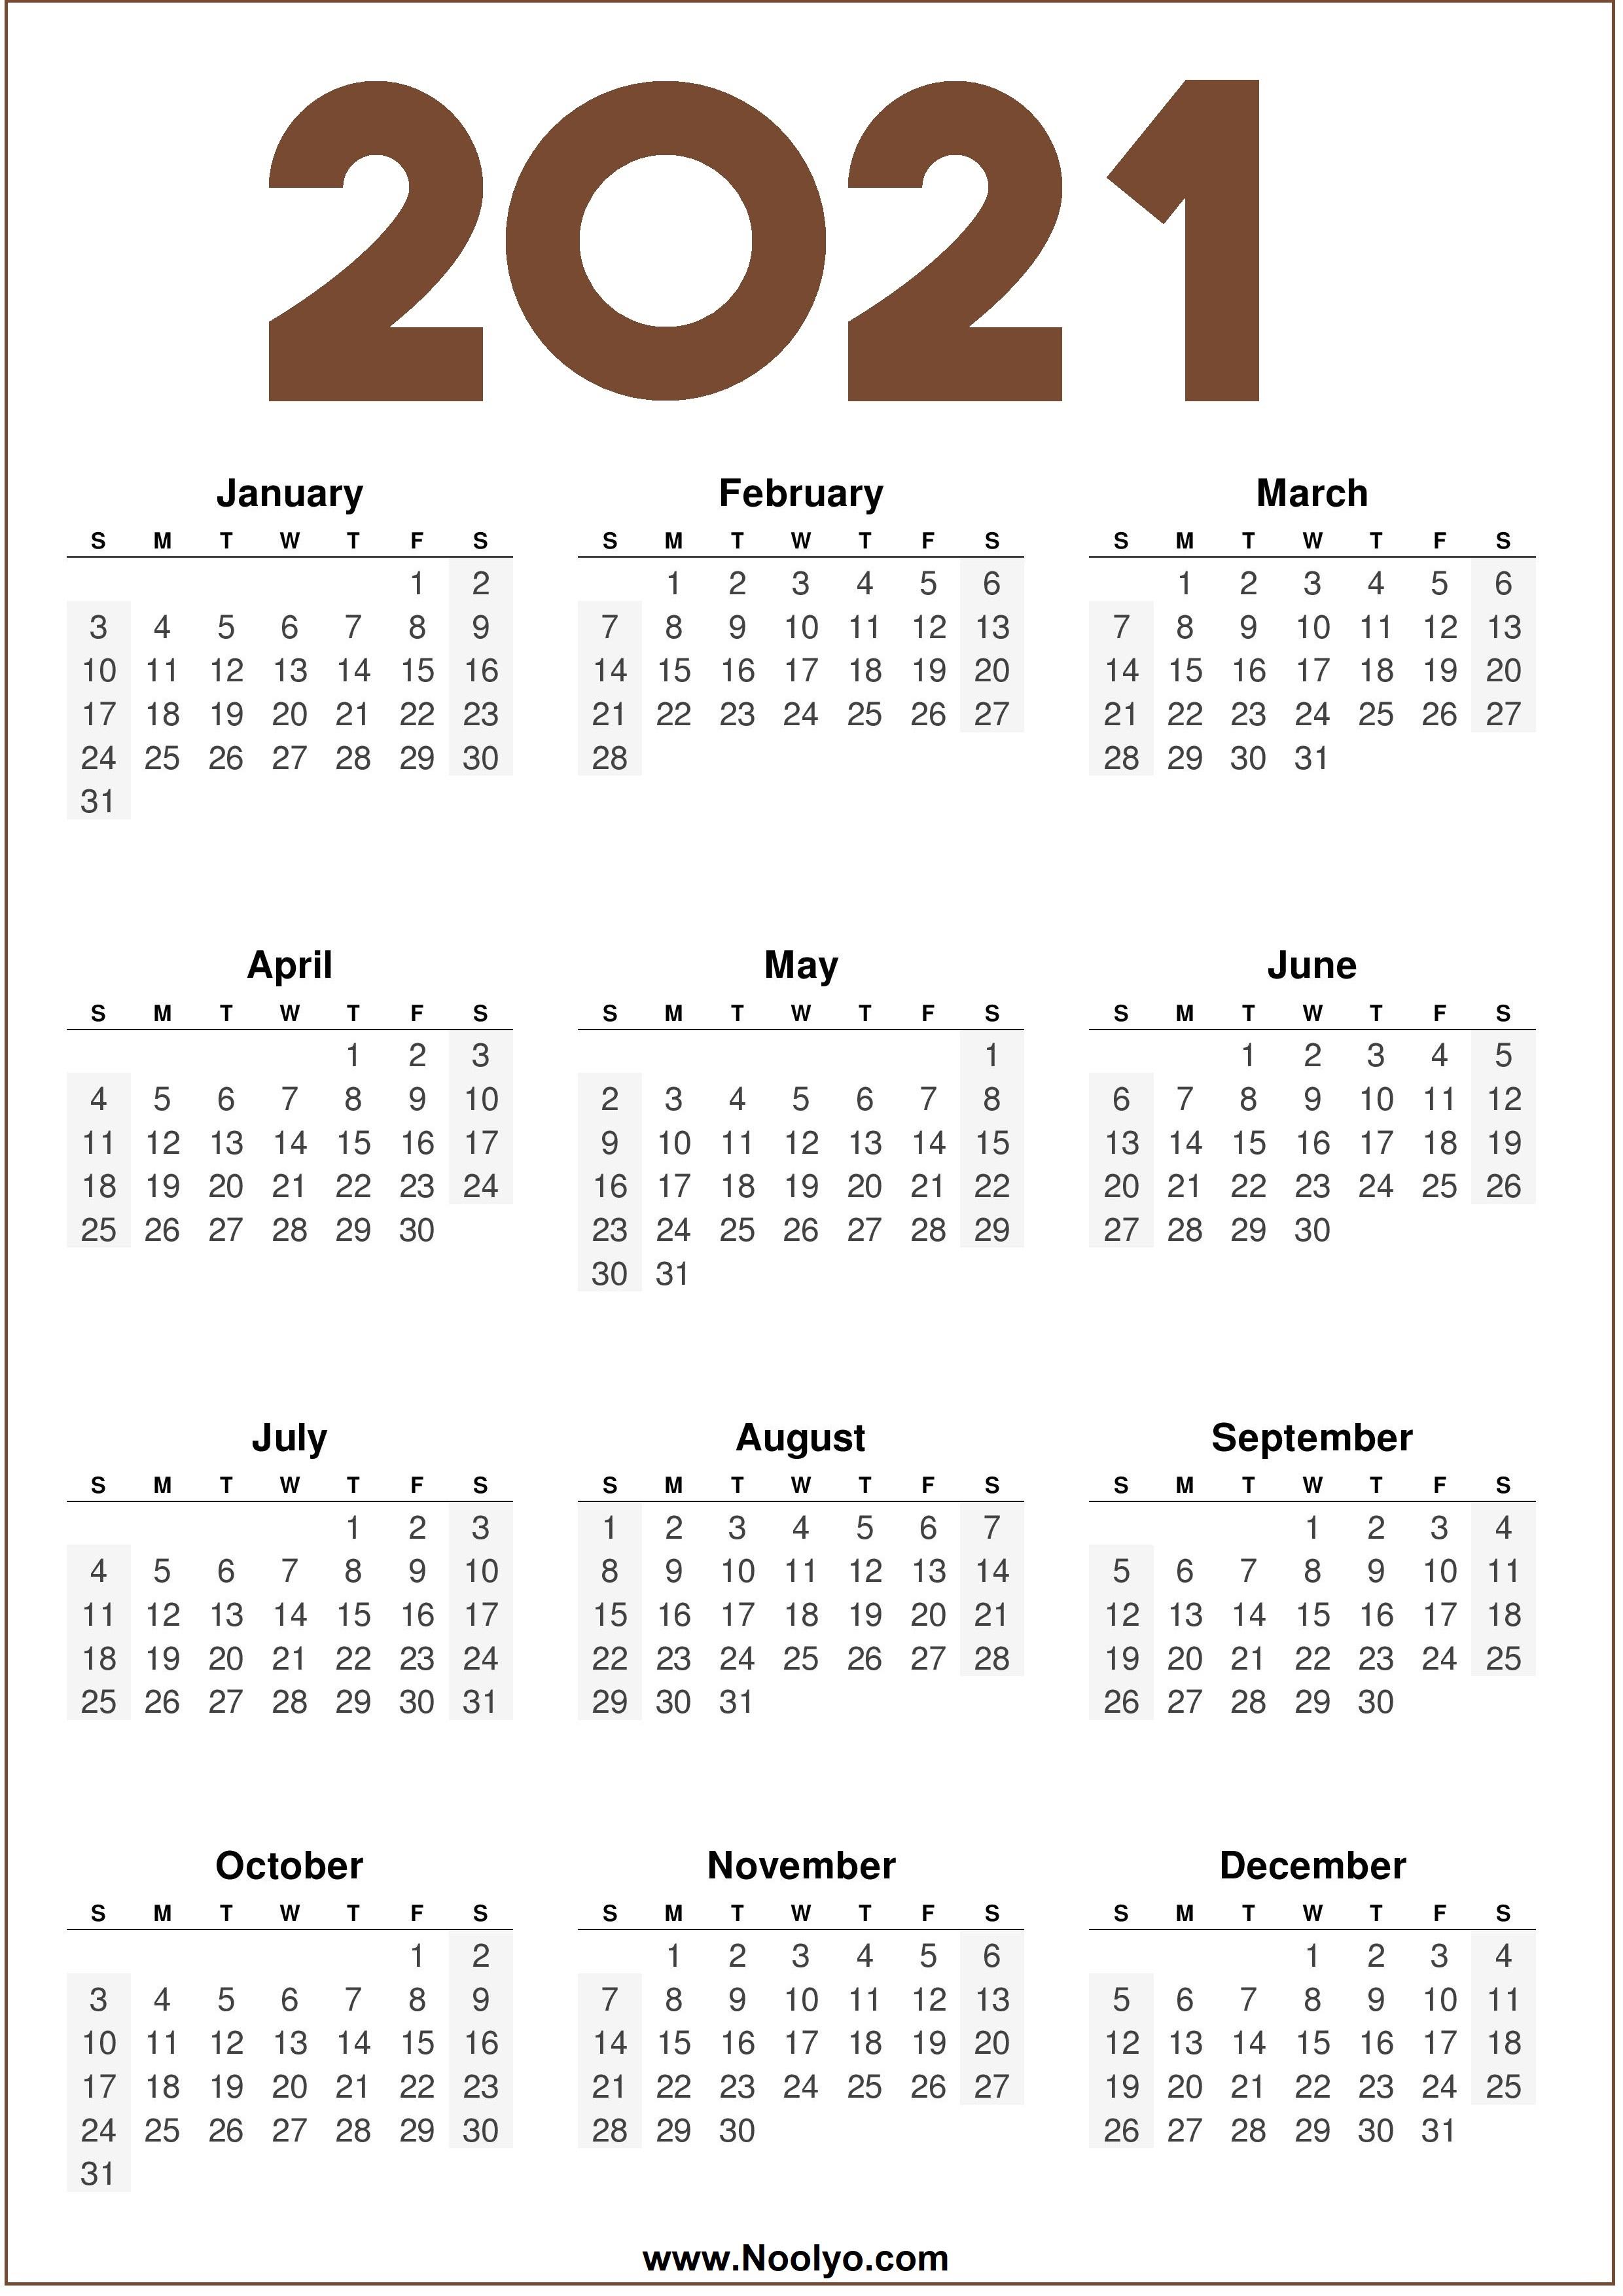 2021 Calendar One Page Printable - Noolyo.com